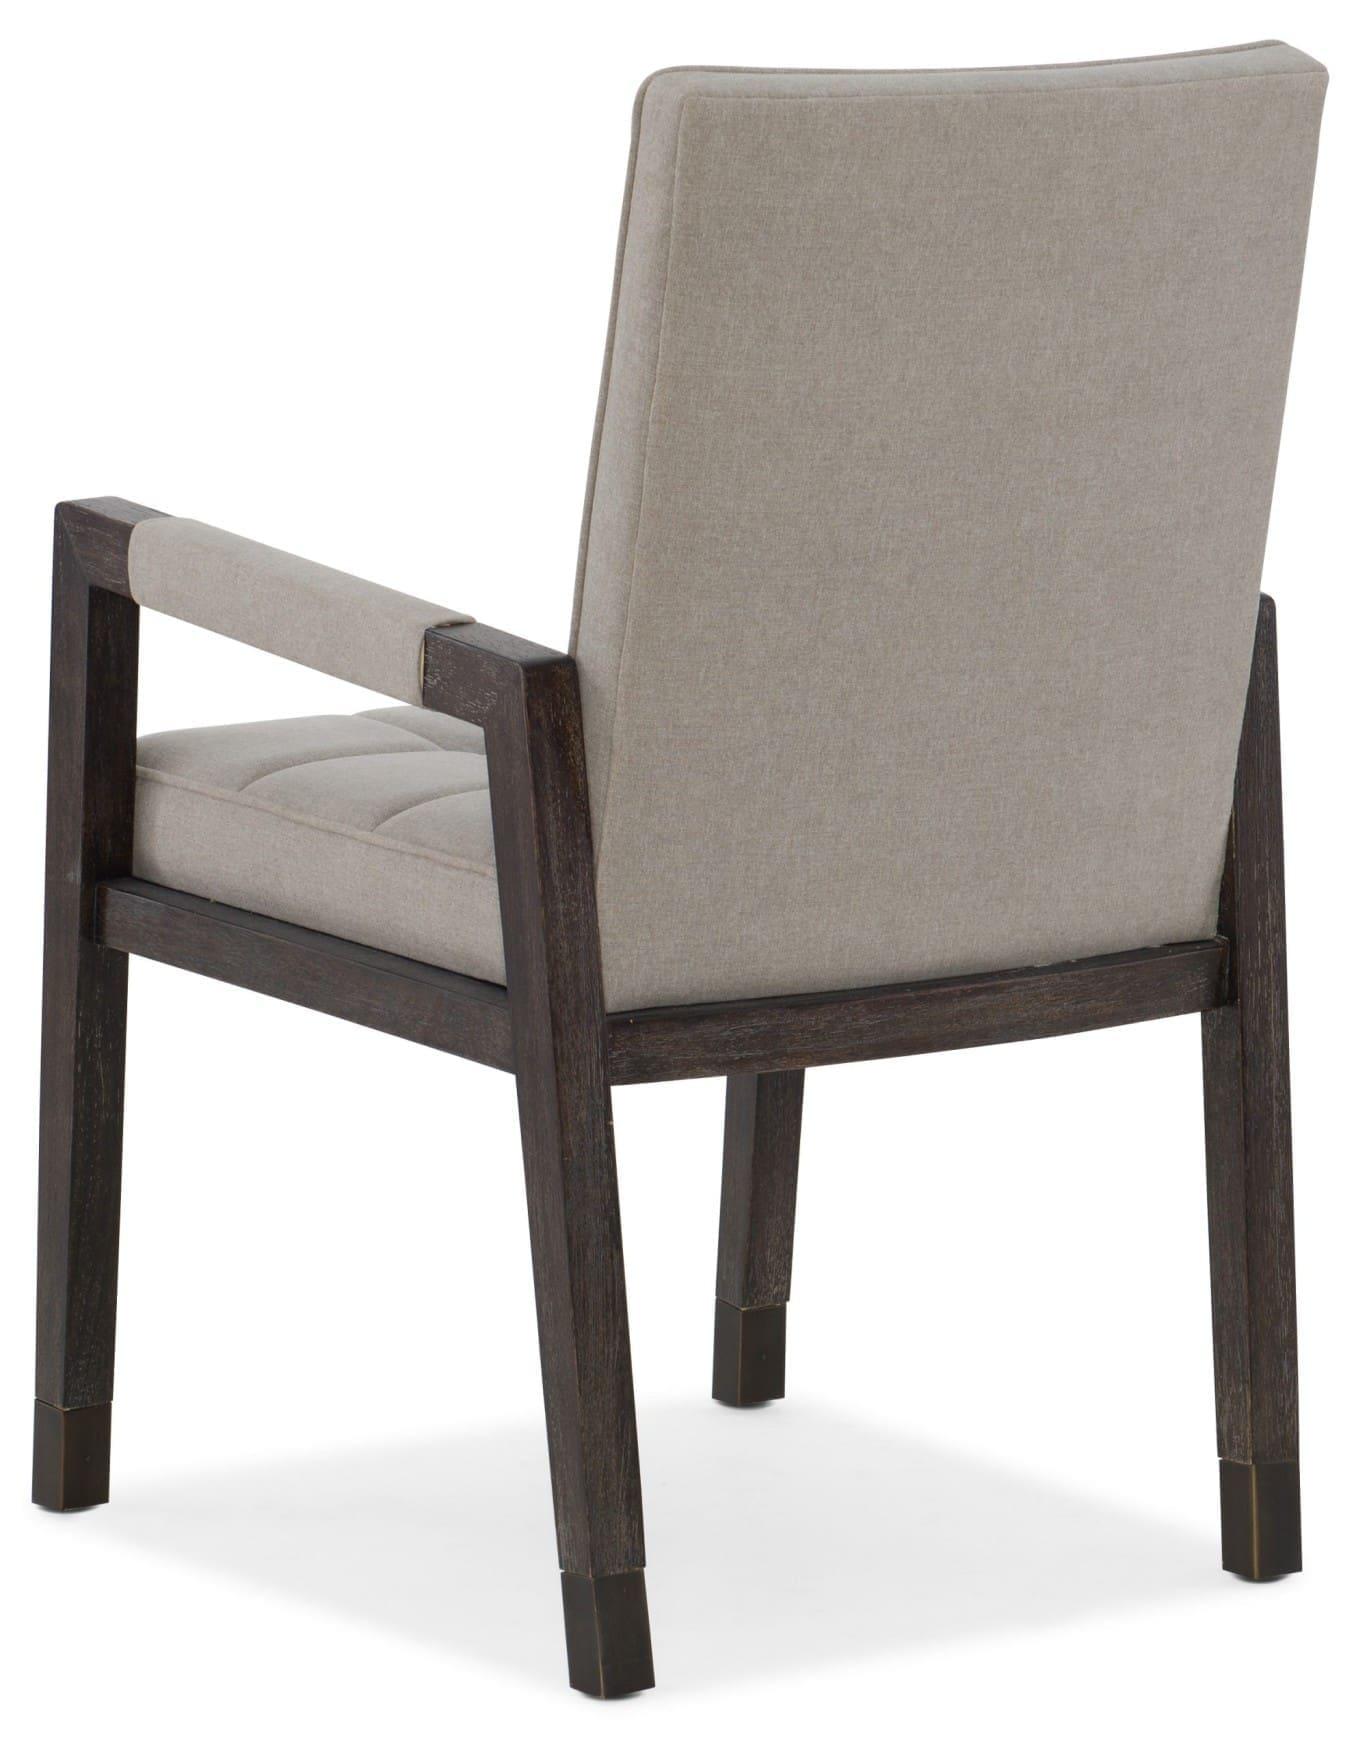 Miramar Aventura Cupertino Upholstered Arm Chair - 2 per carton/price ea